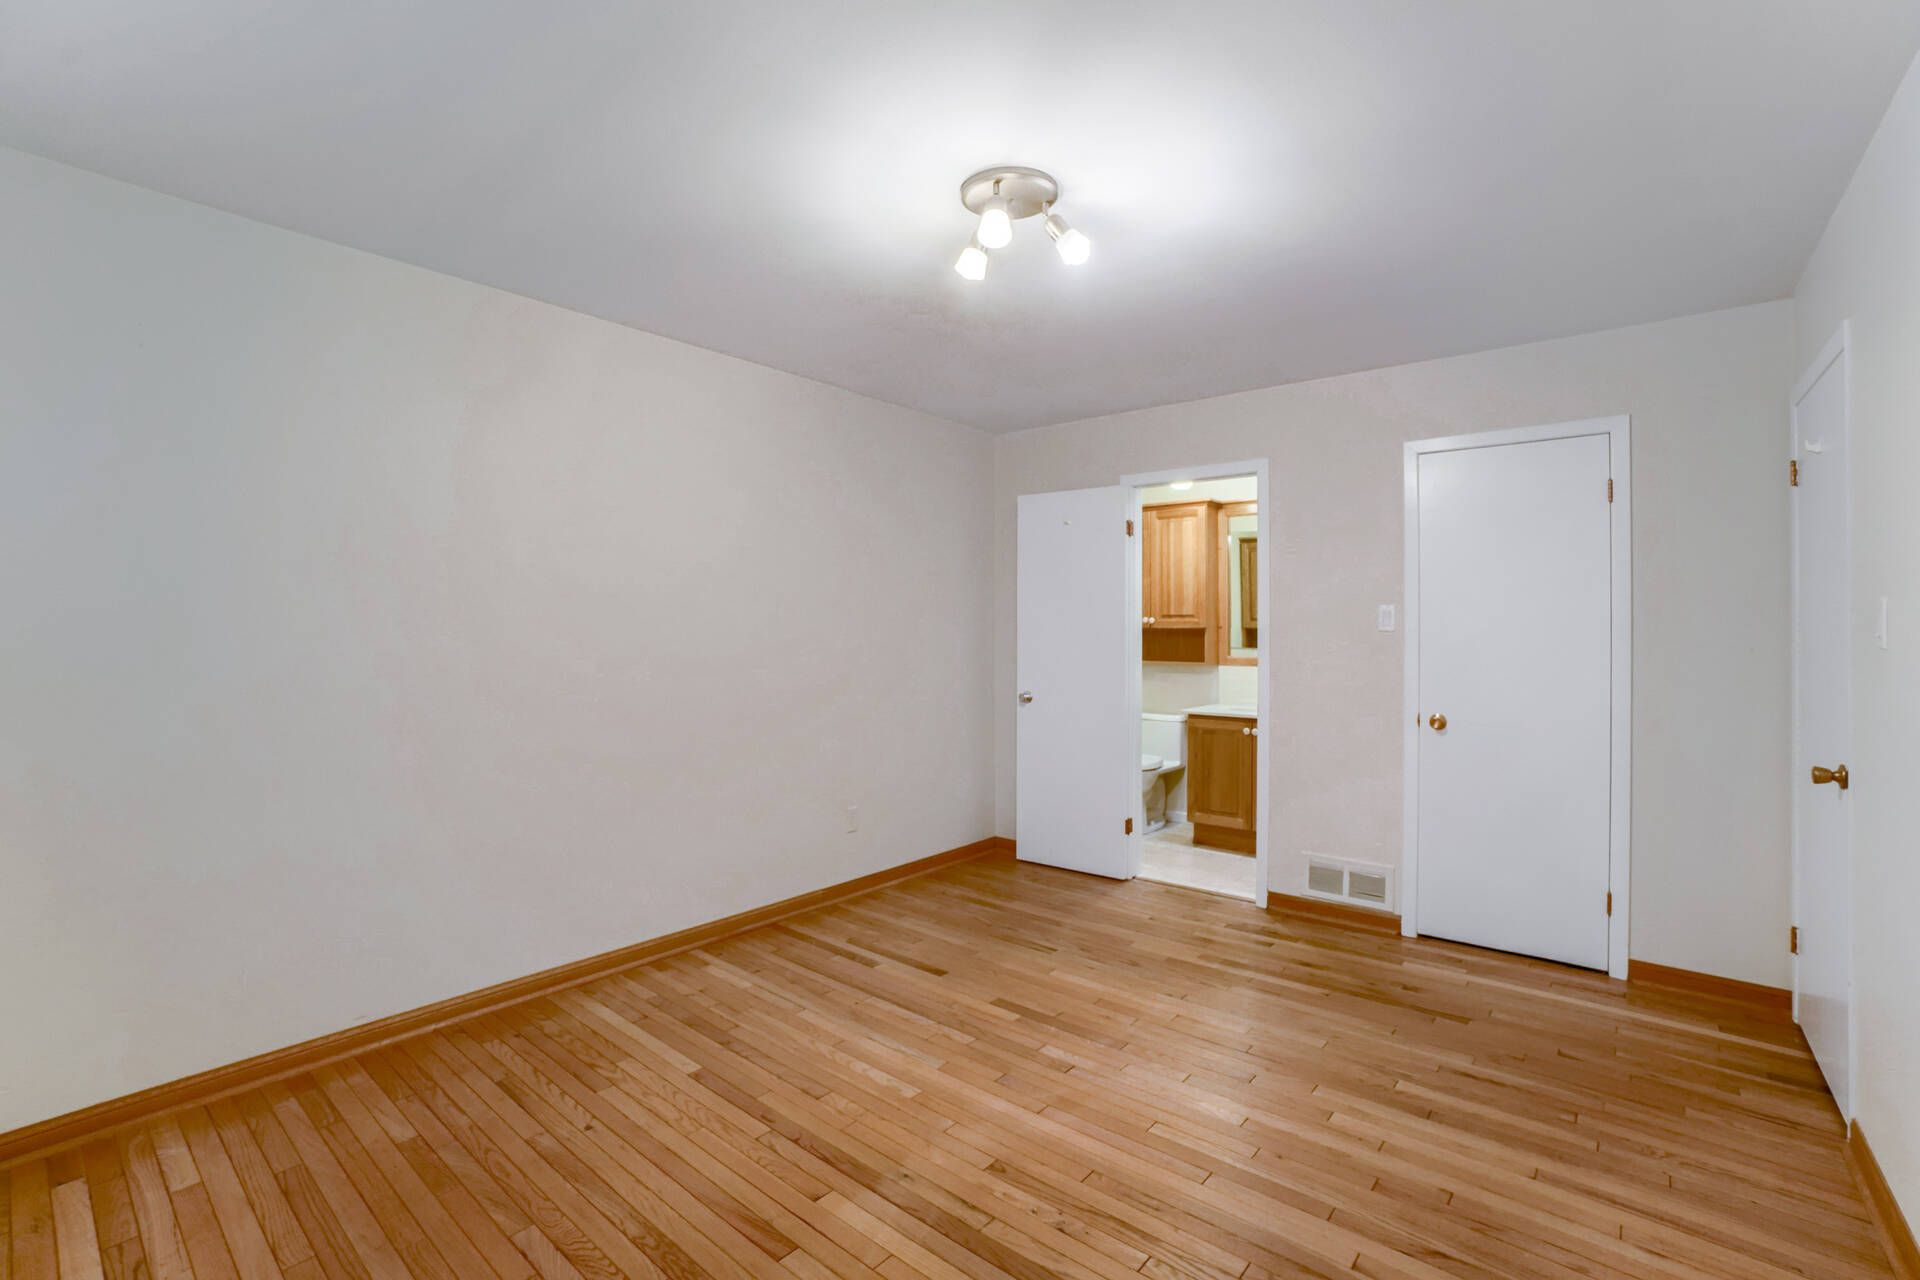 Primary Bedroom - 169 Wedgewood Dr, Oakville - Elite3 & Team at 169 Wedgewood Drive, Eastlake, Oakville